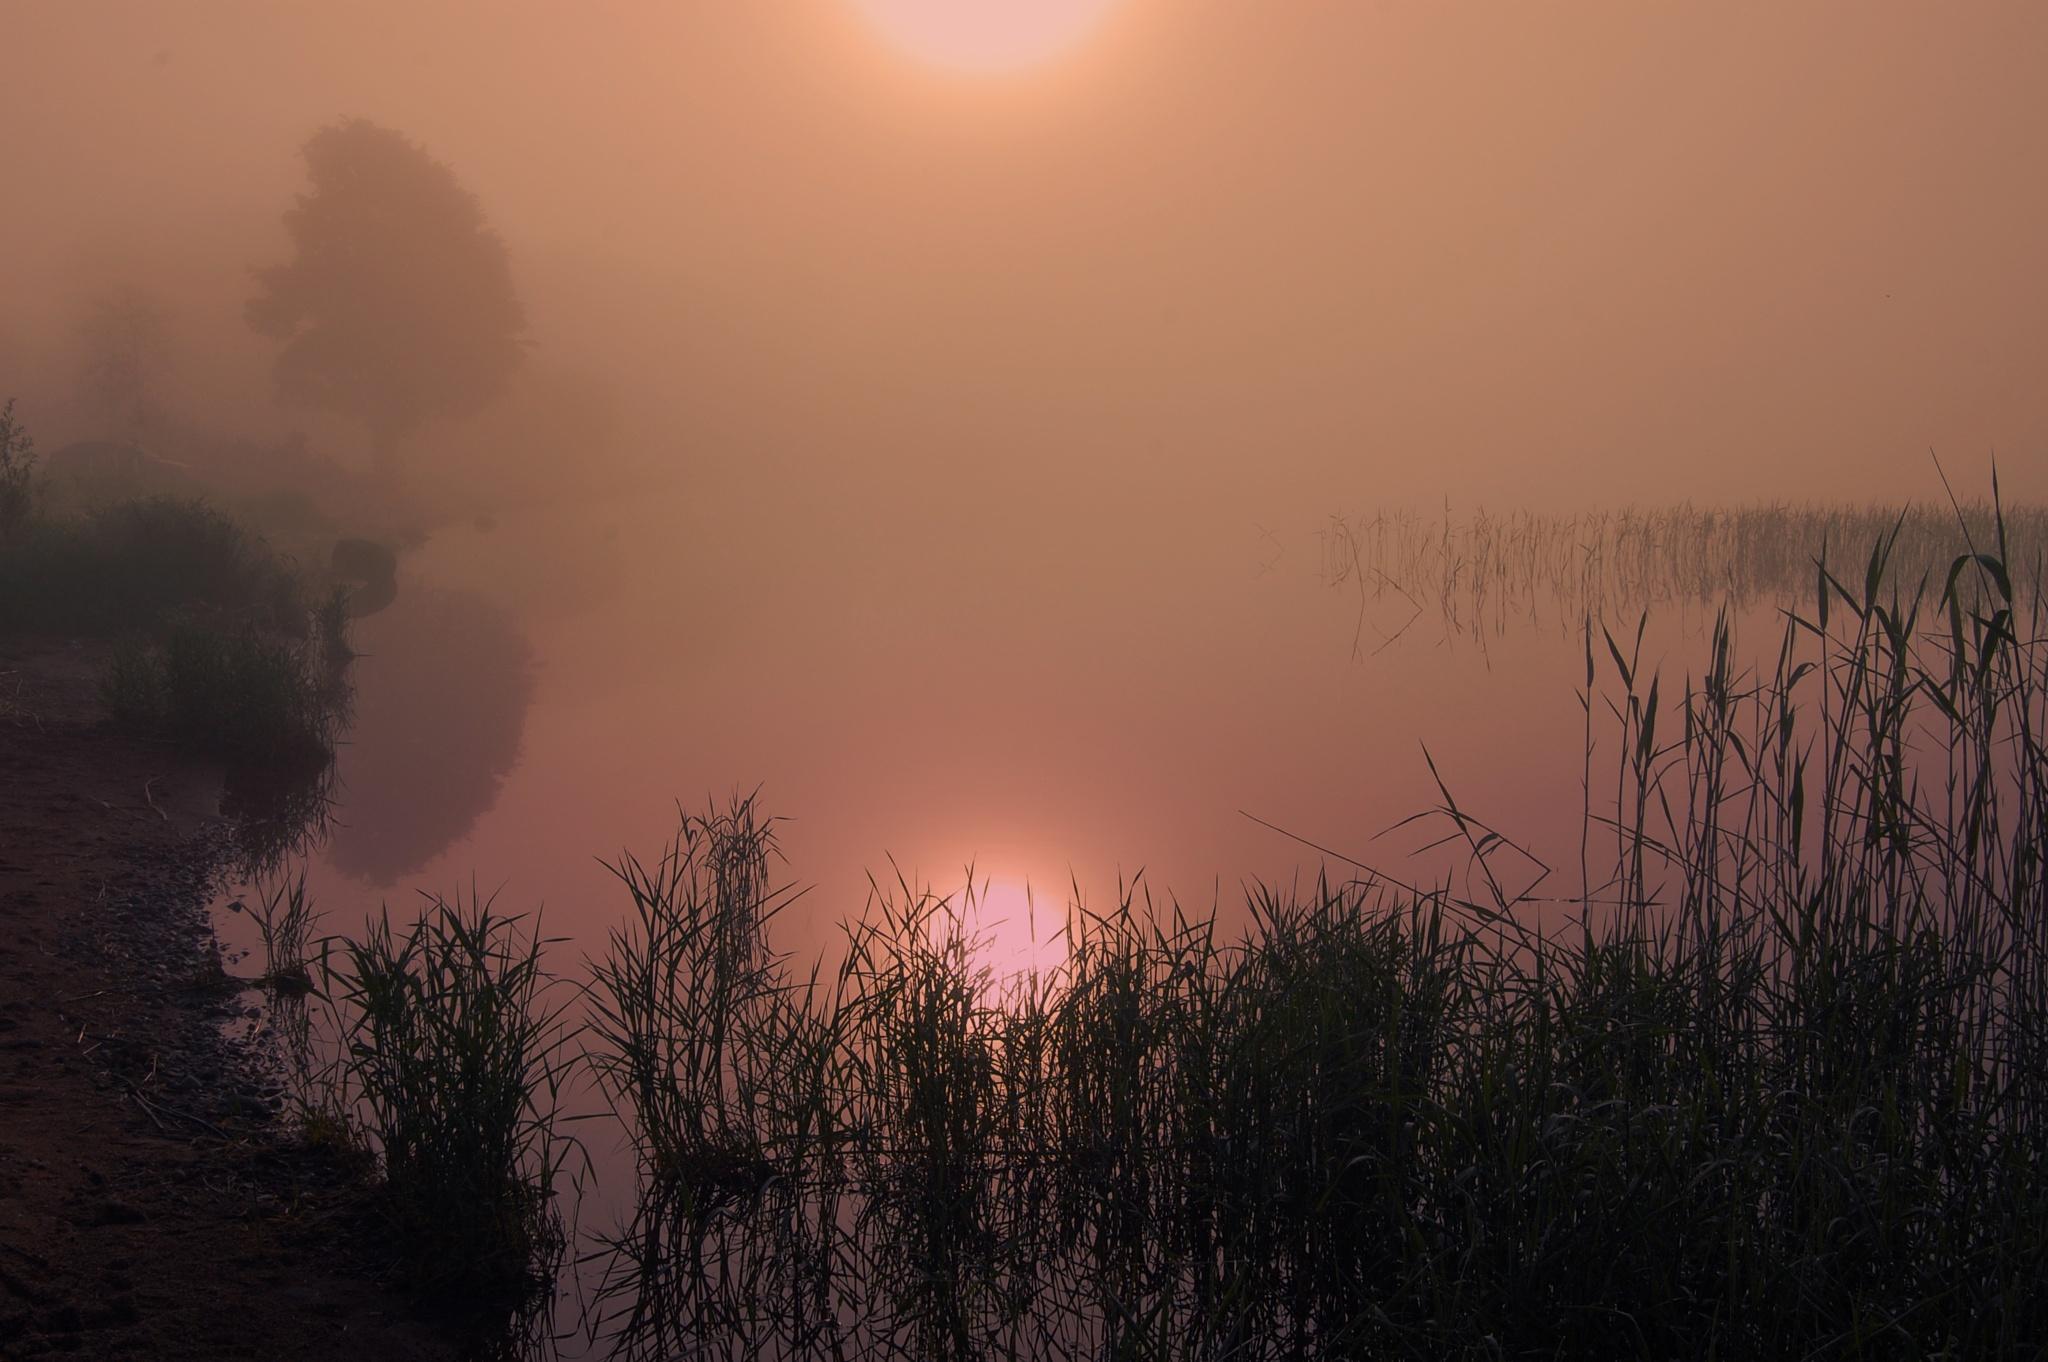 Lake Seliger by Michael Stapfer